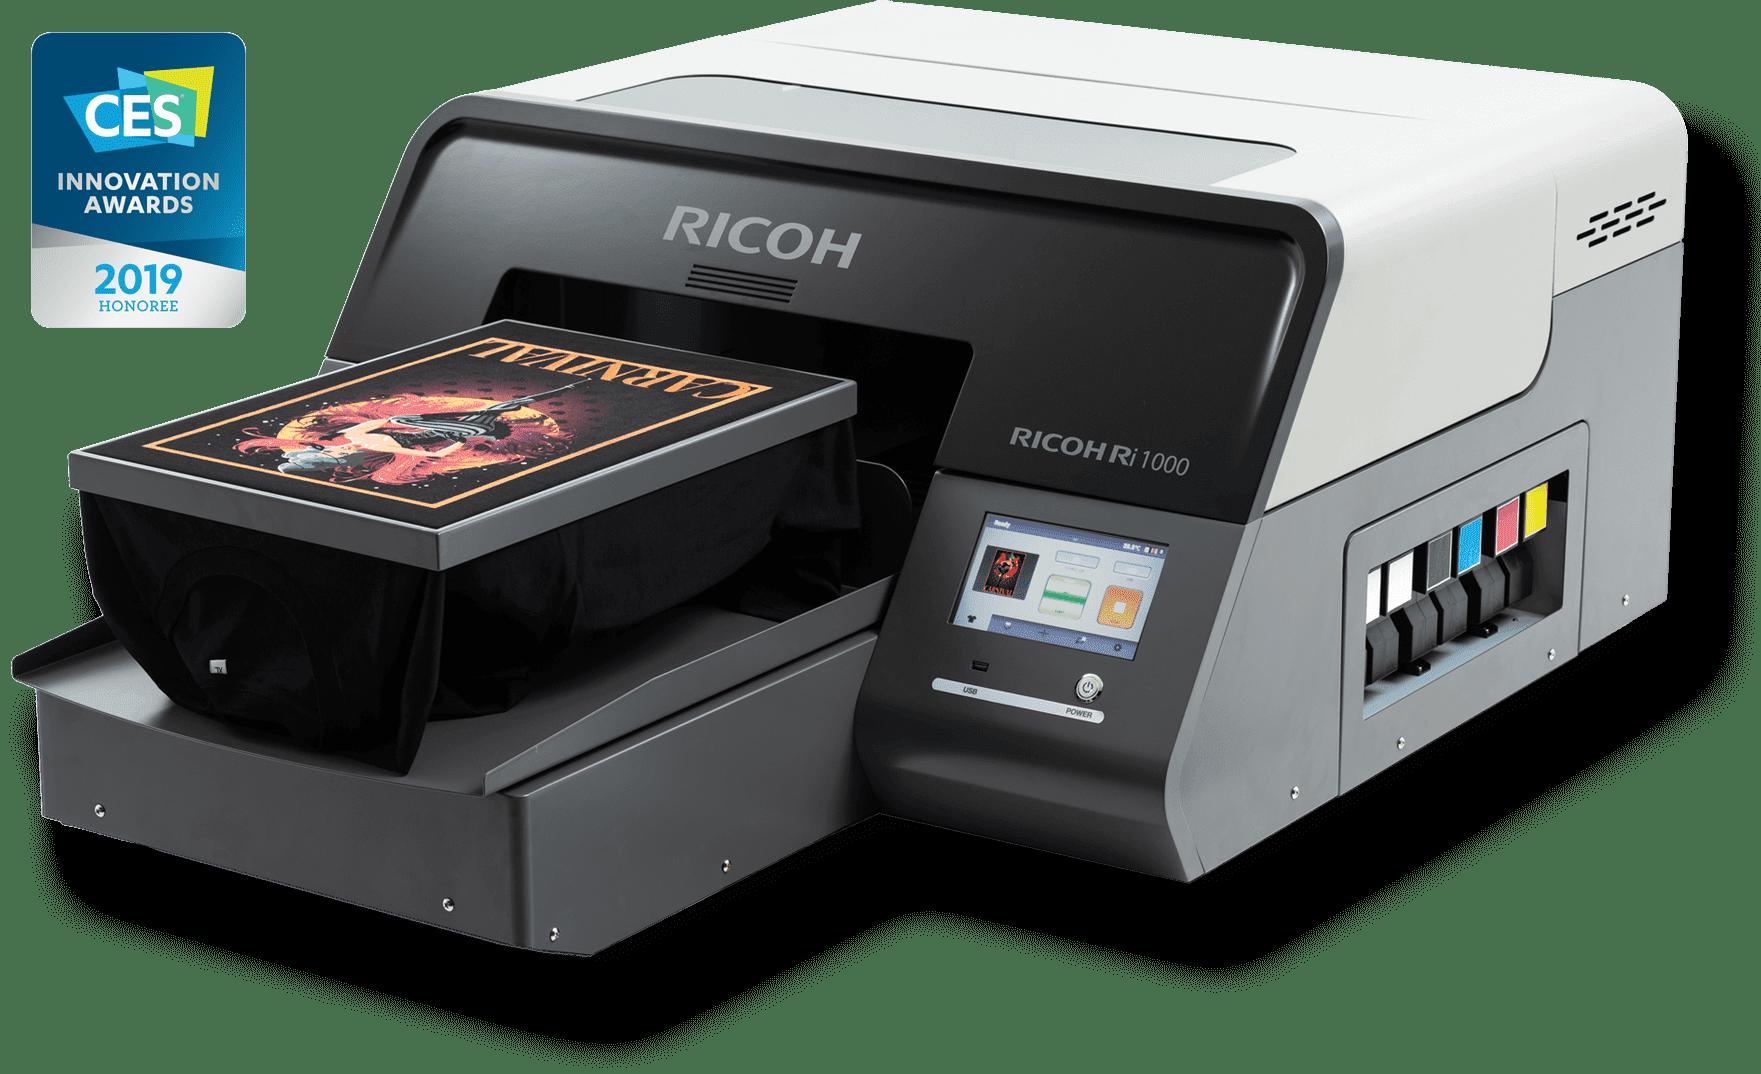 Ricoh RI 1000 Printer CES